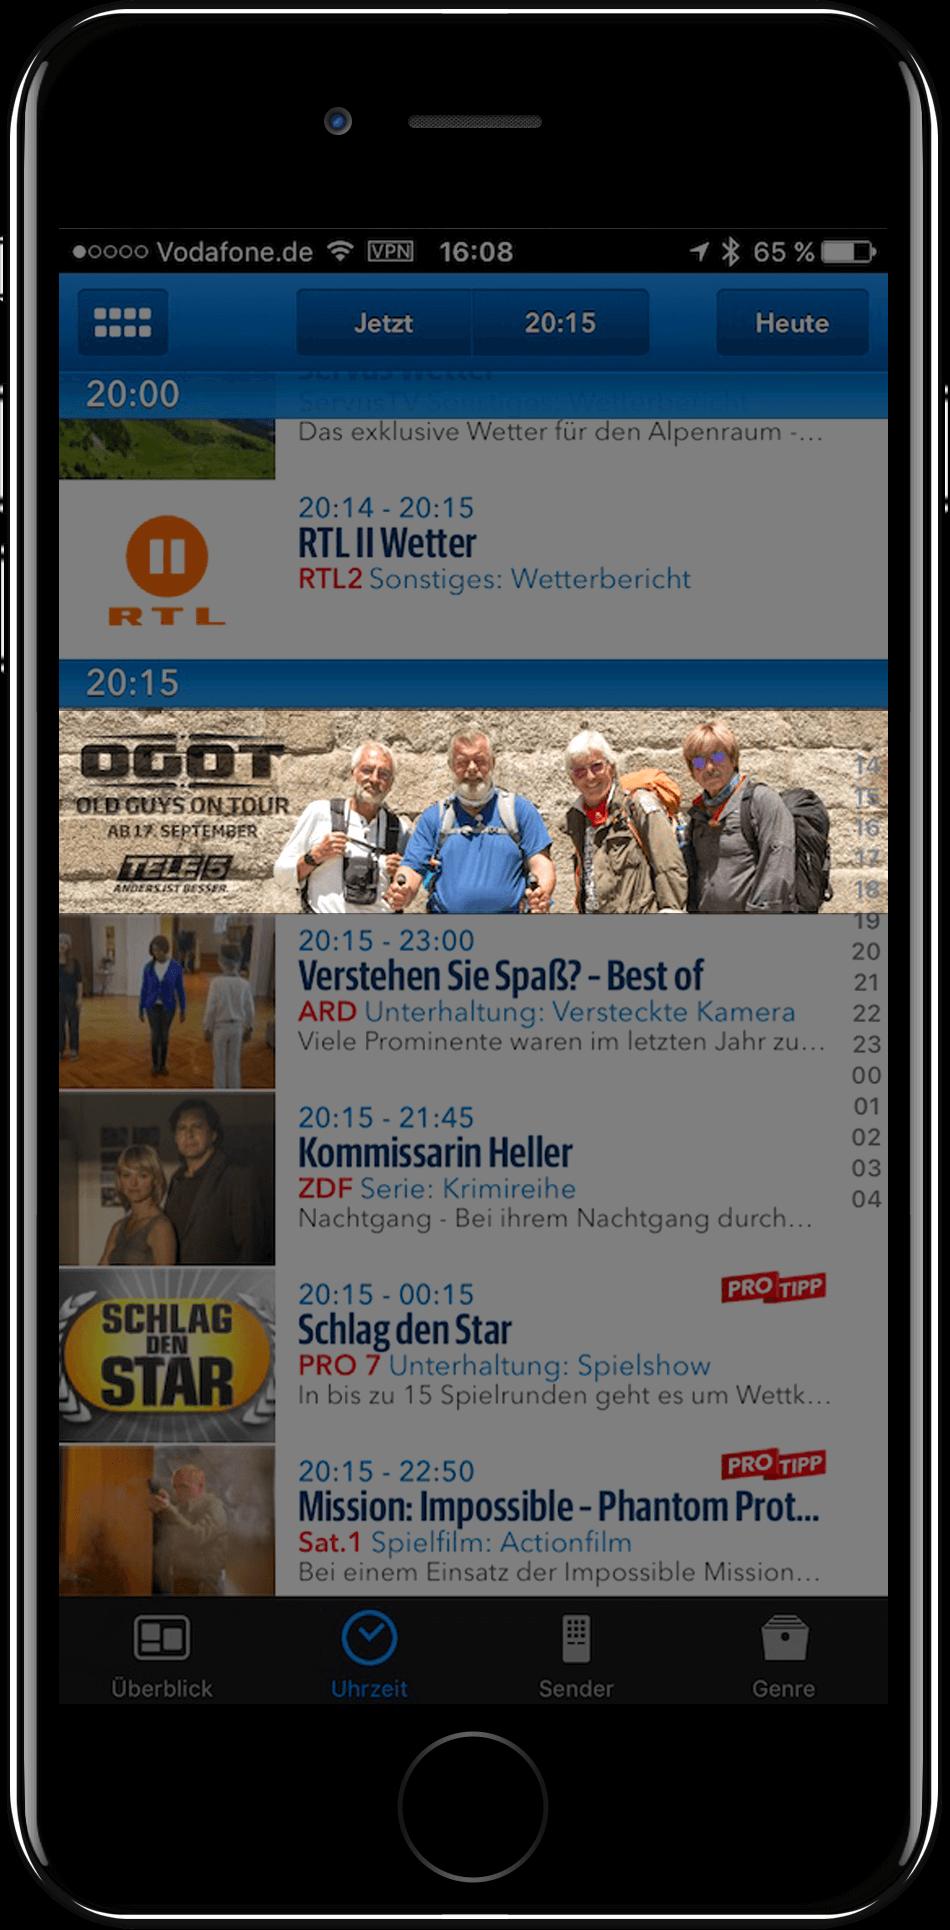 Tele5 Werbung App